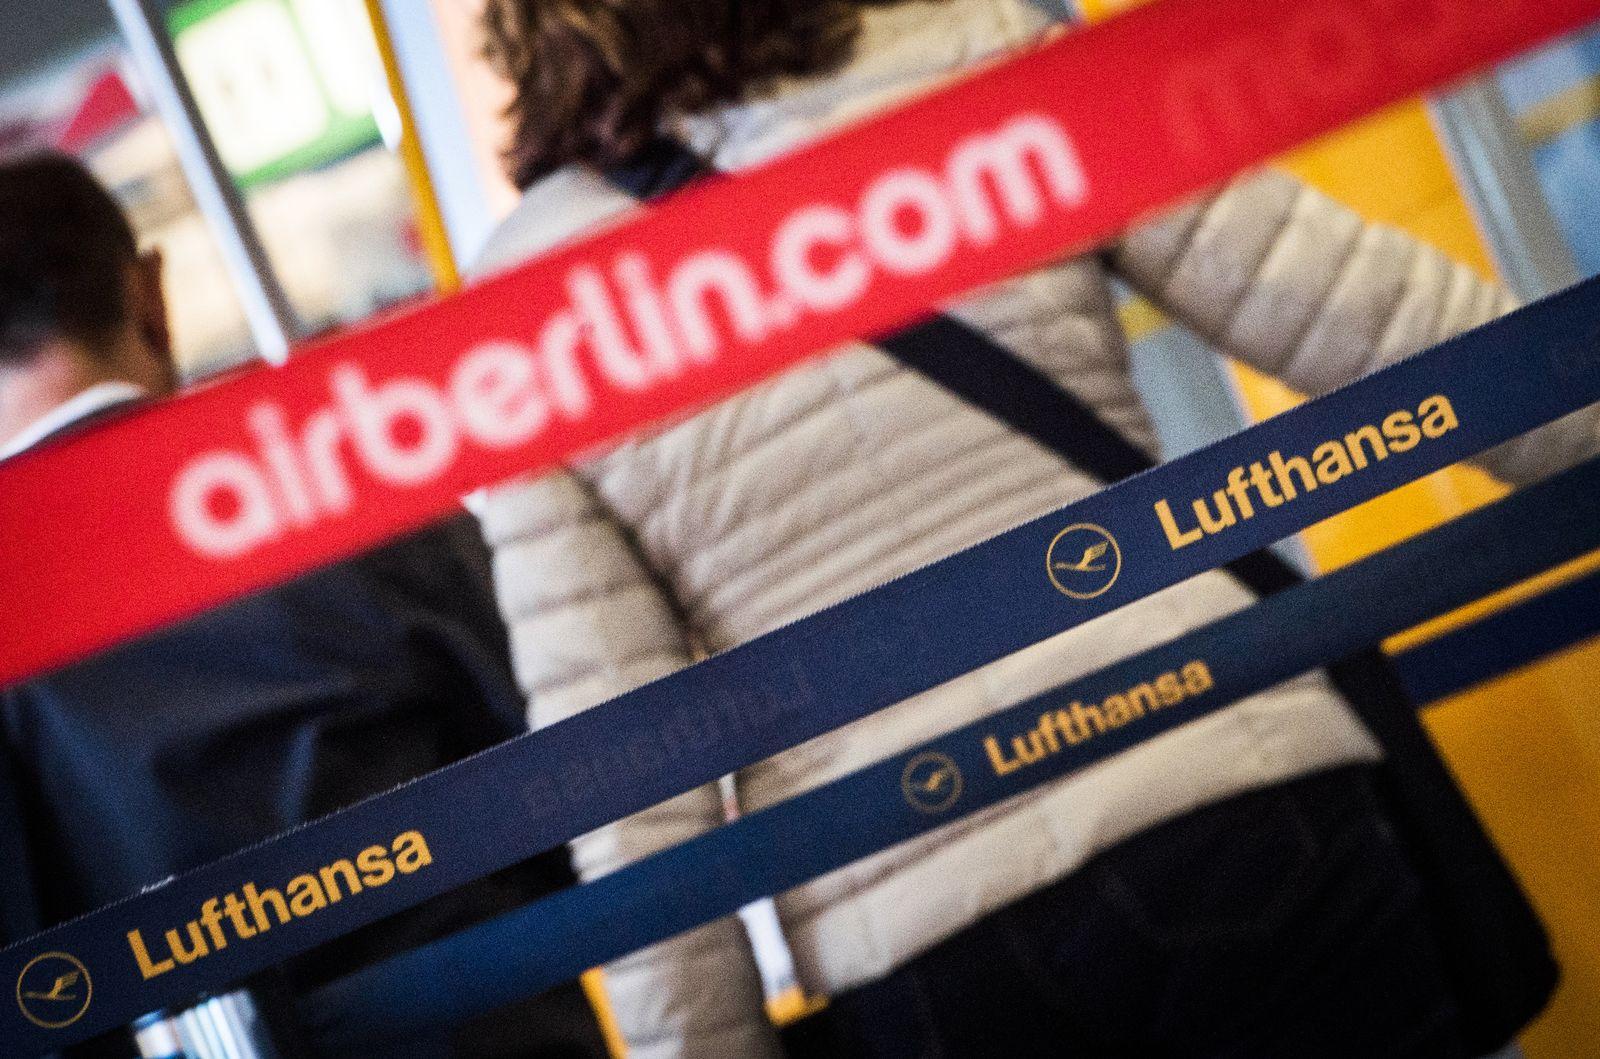 Air berlin / Lufthansa